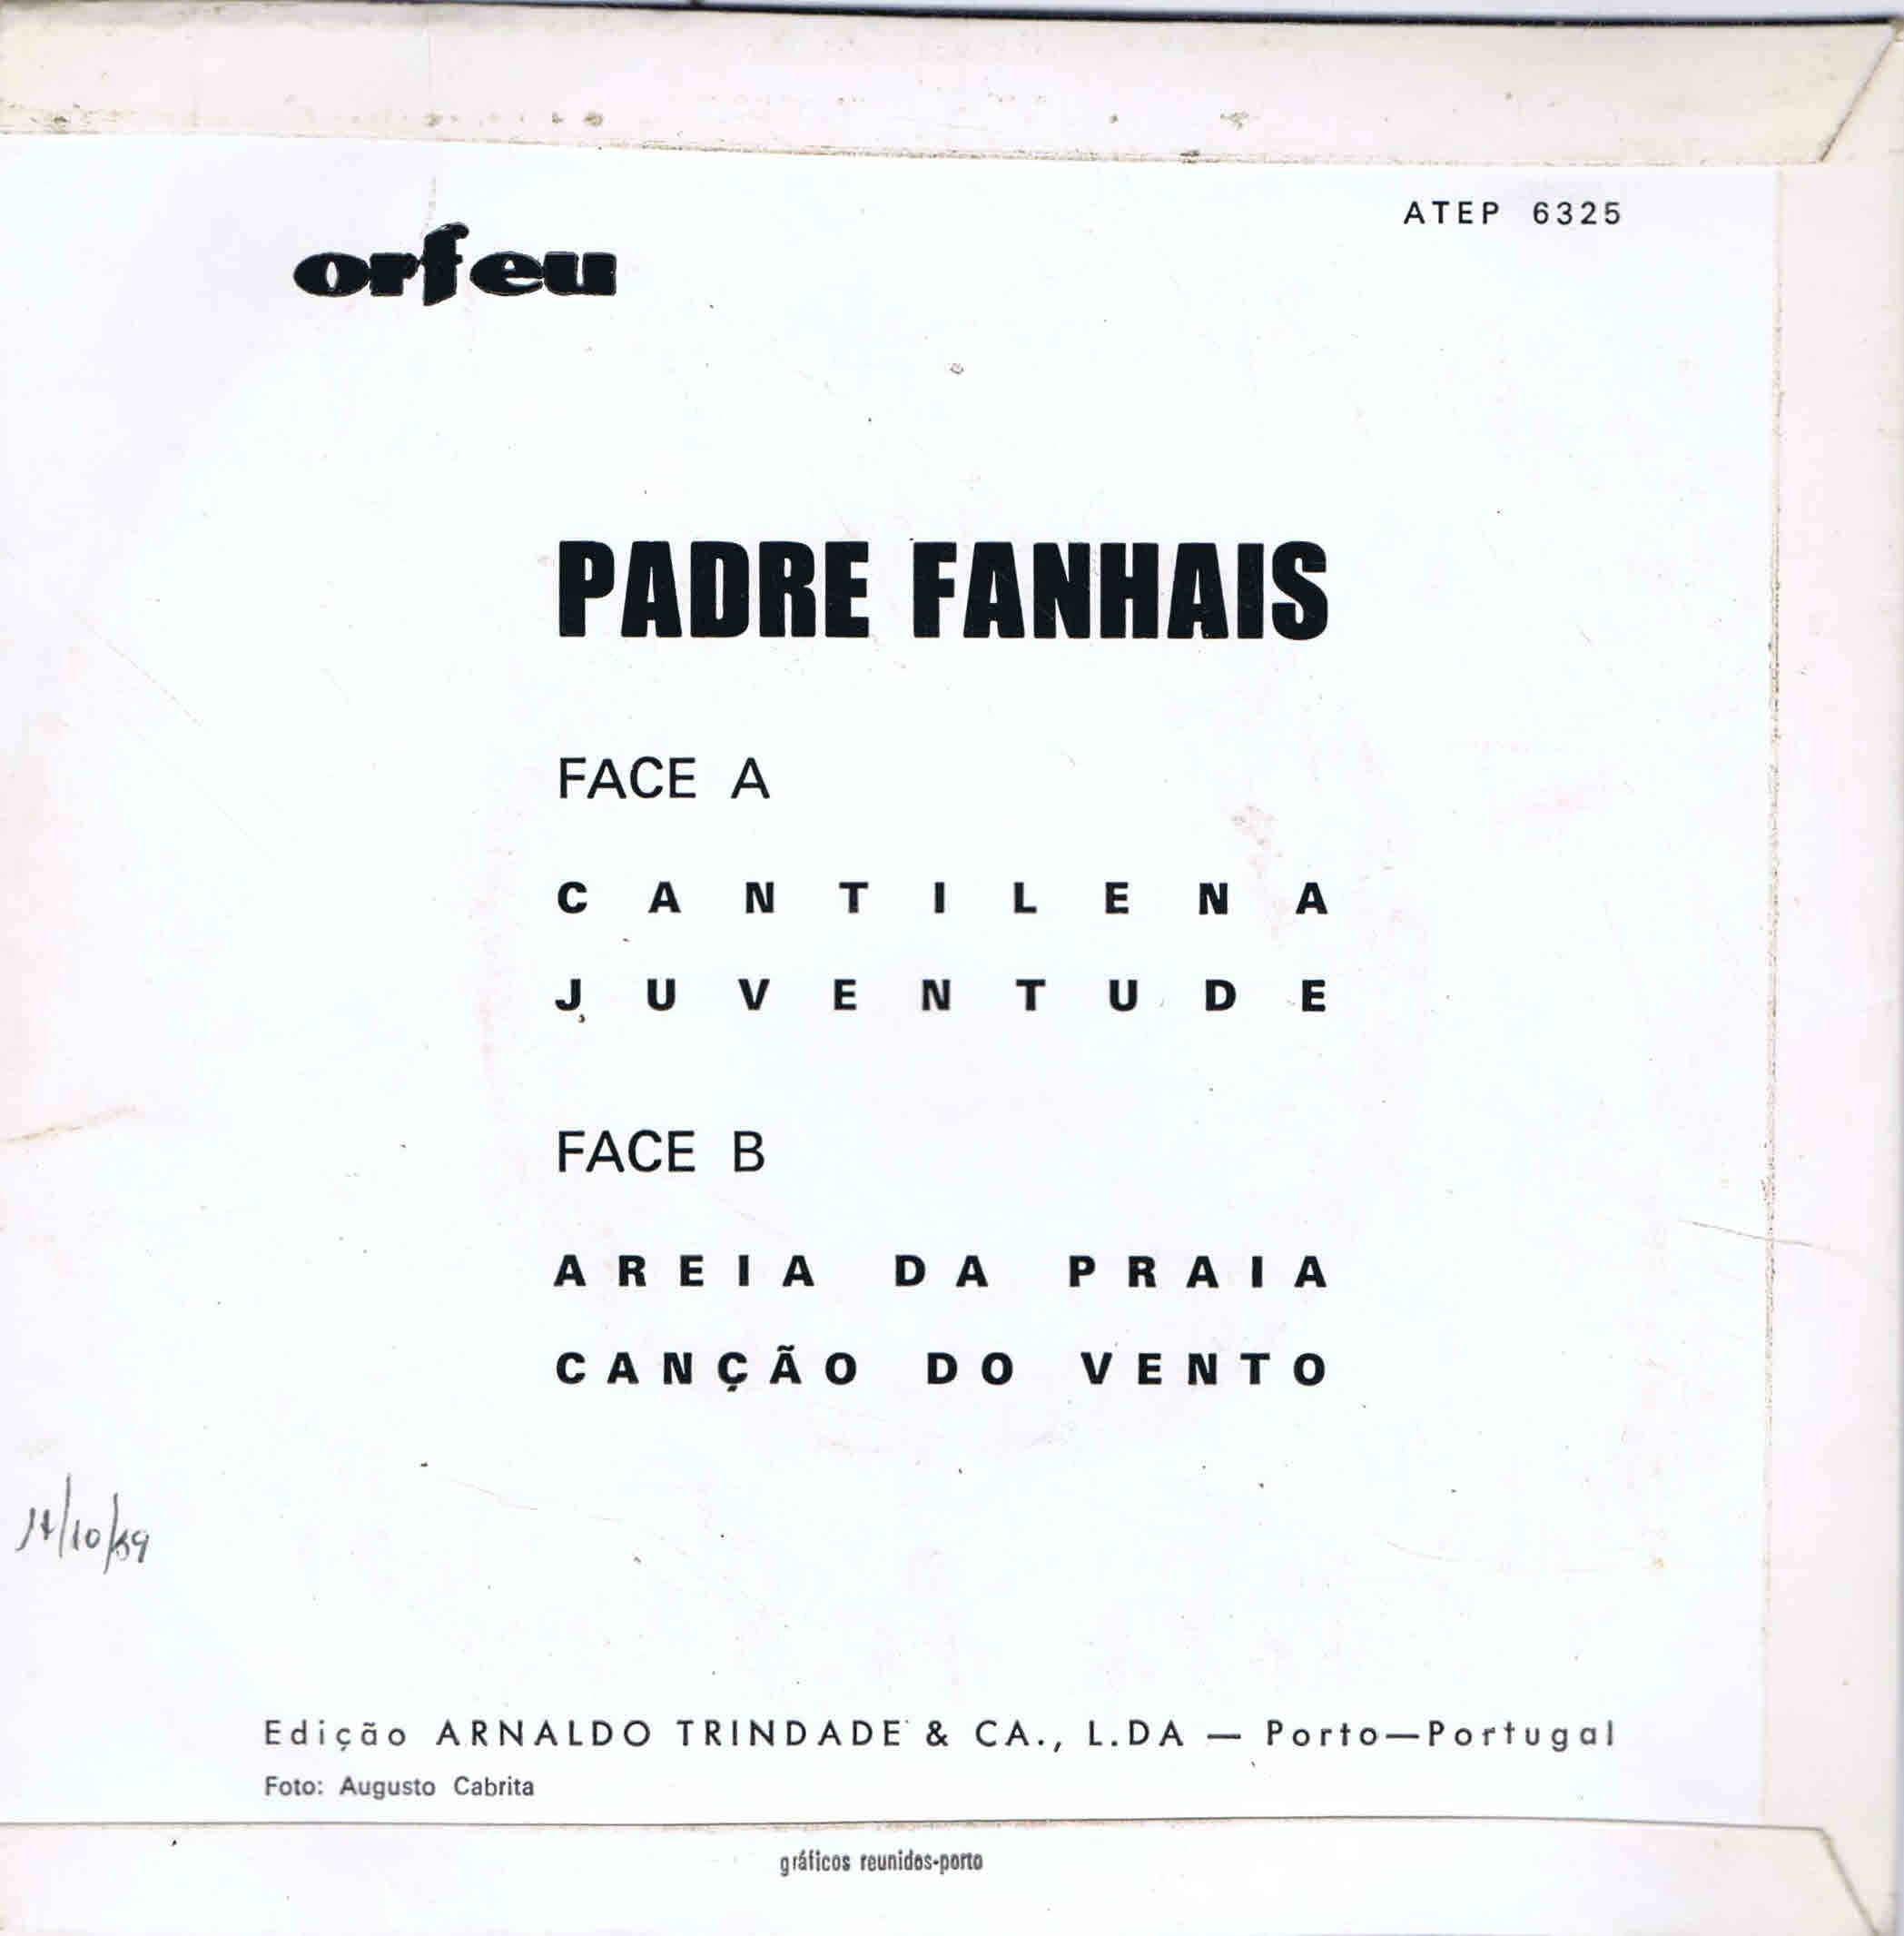 padre fanhais vs